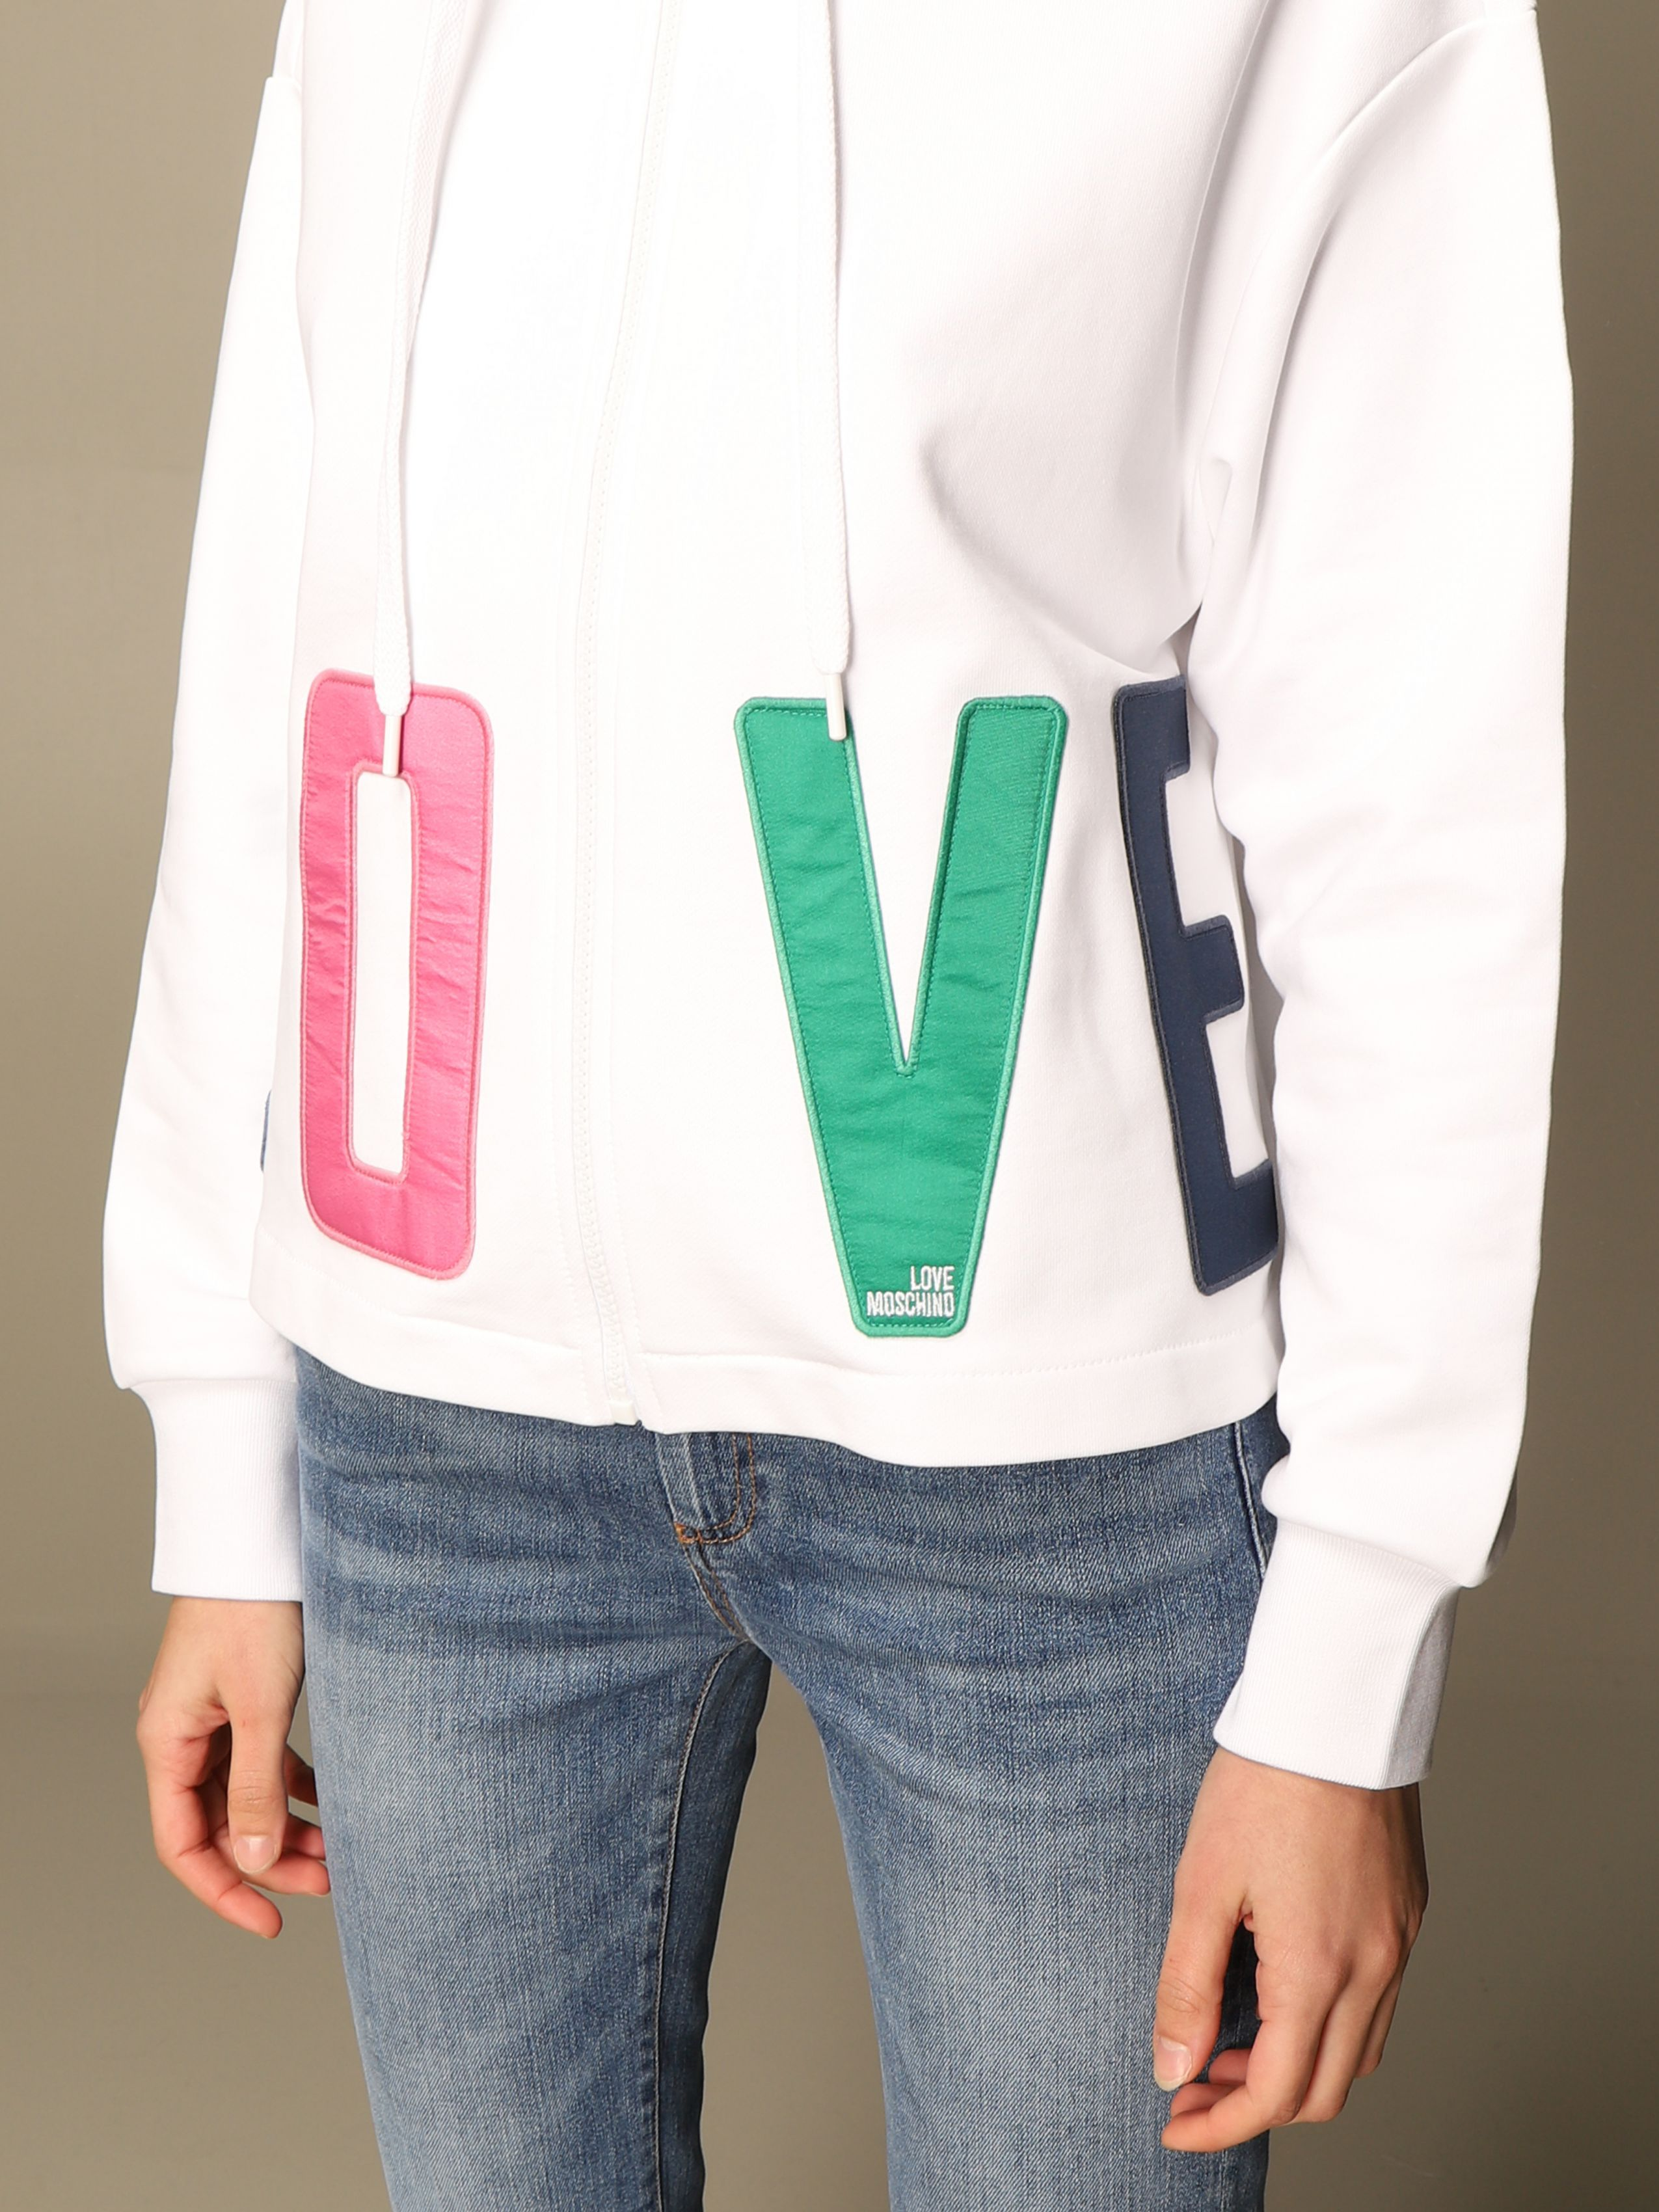 felpa colorful lettering love moschino LOVE MOSCHINO | Felpe | W3381 80 M4266A00